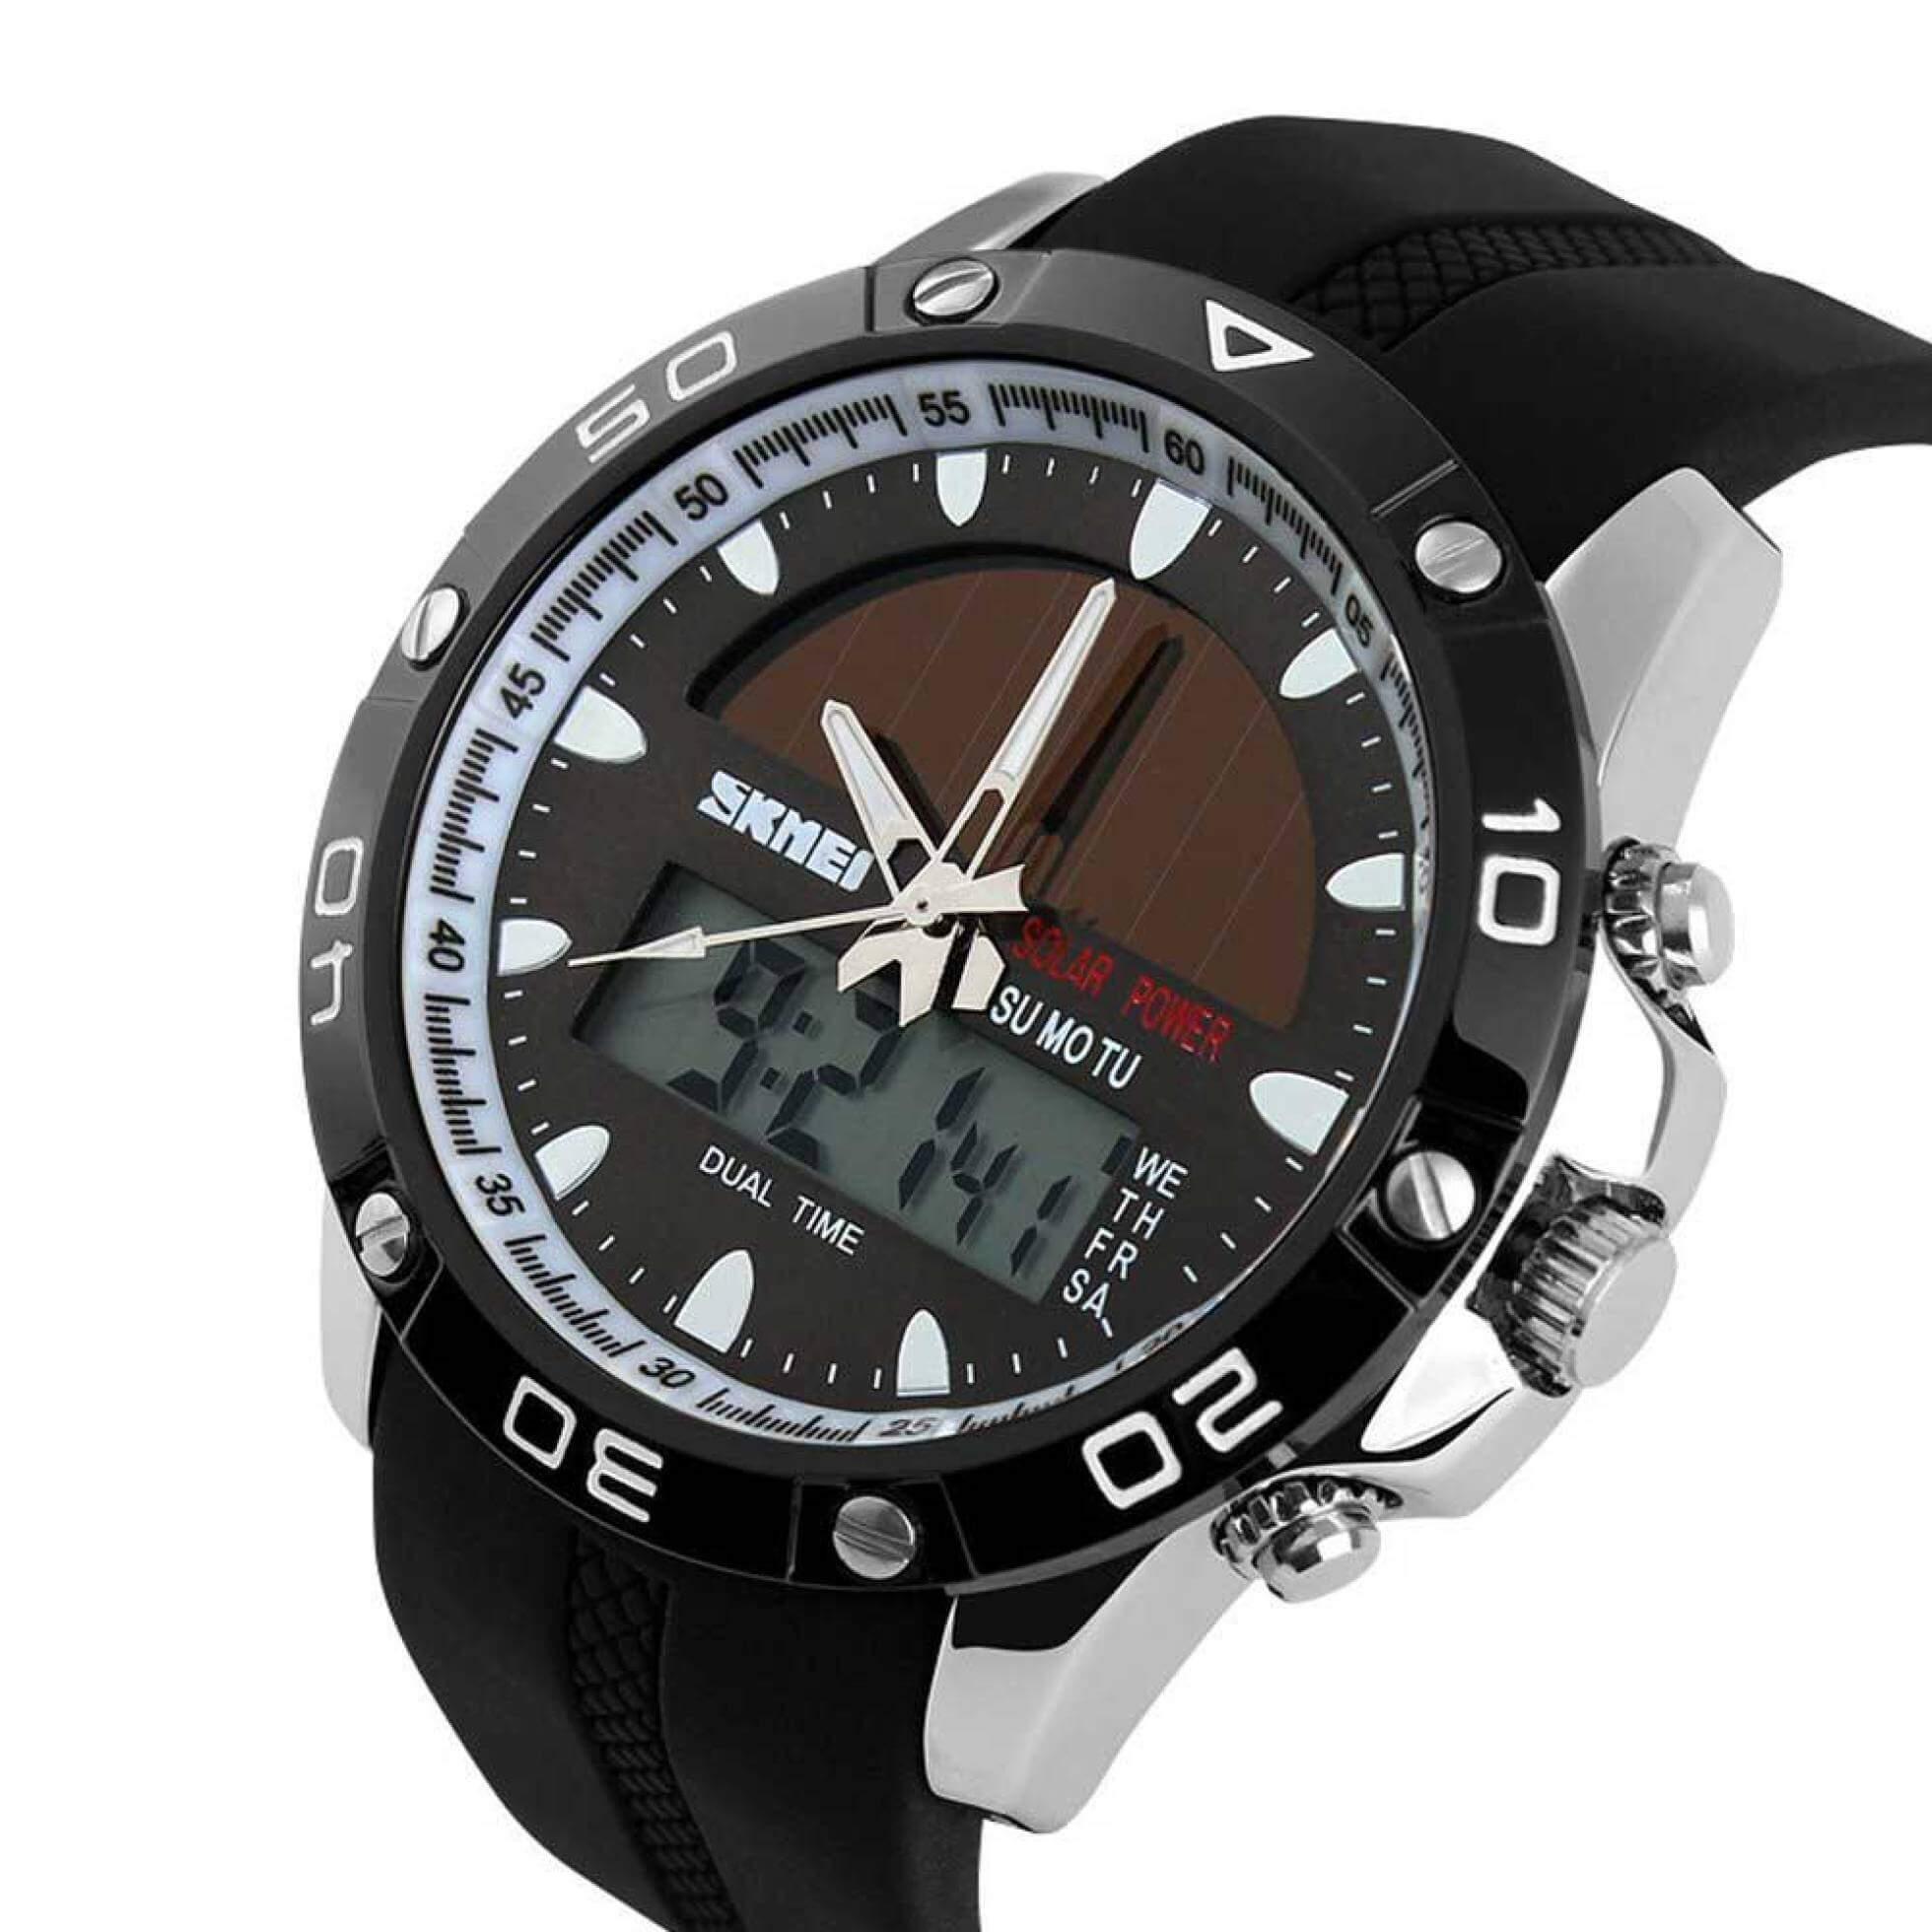 Reloj digital y analógico solar